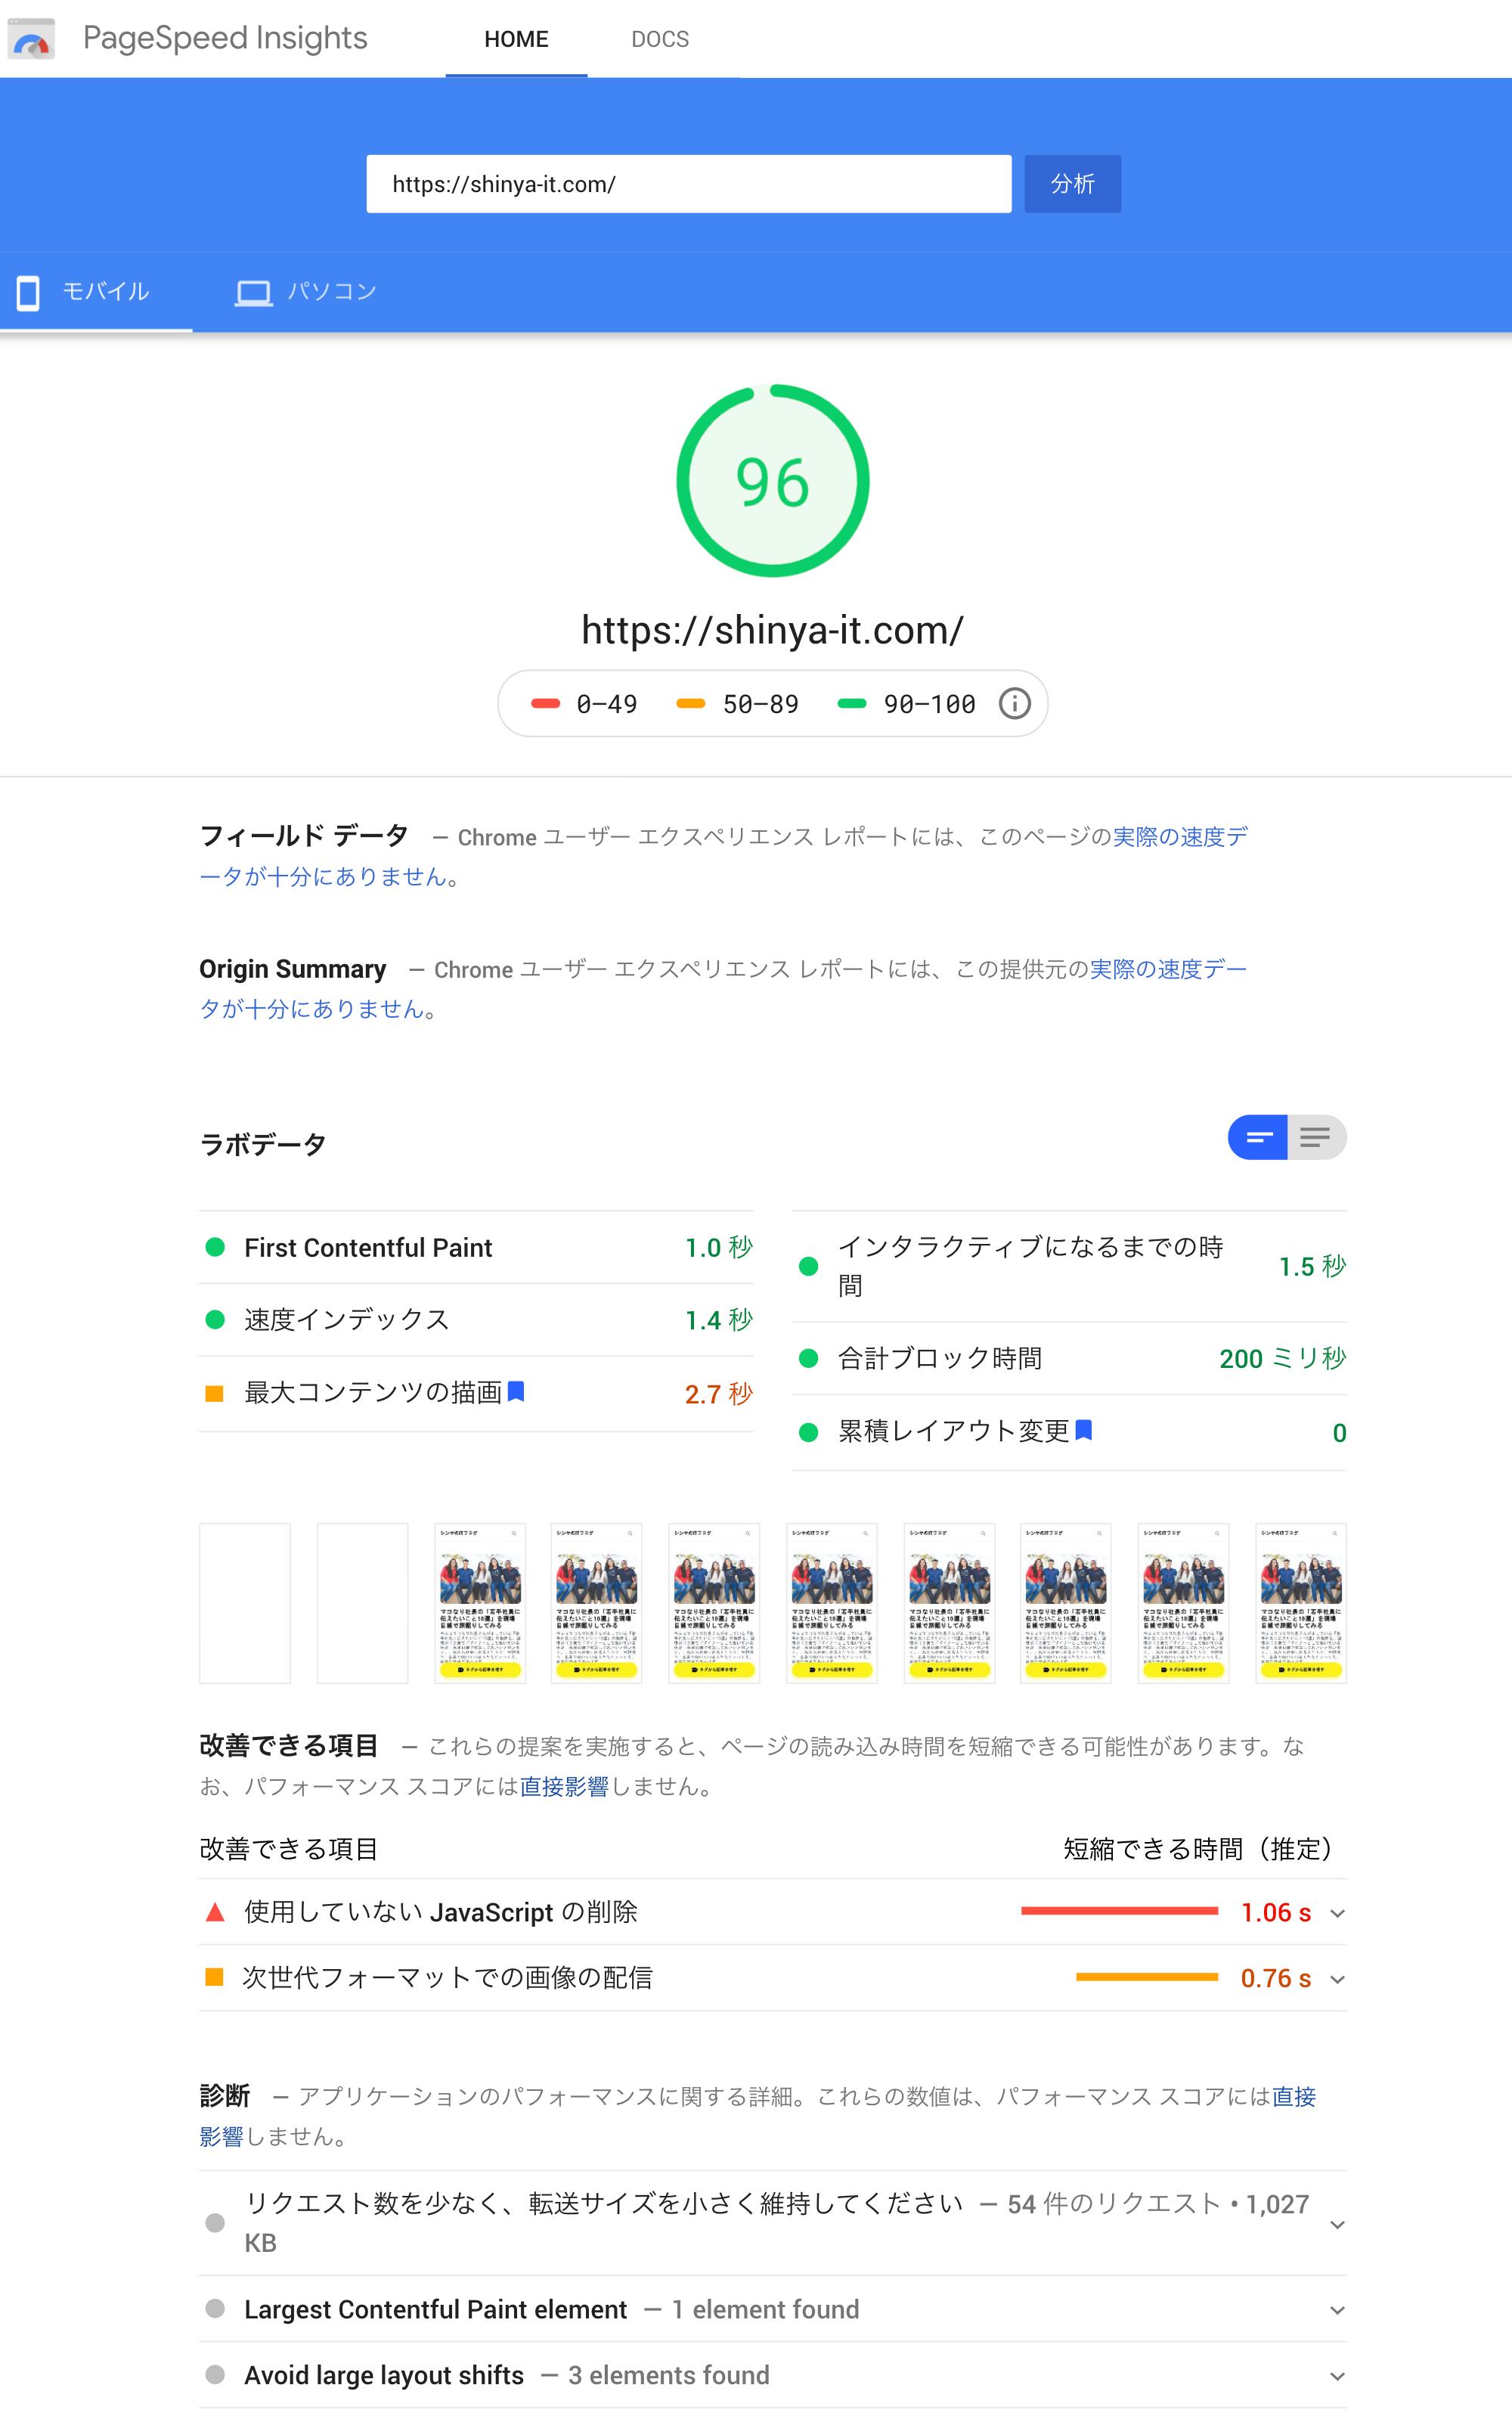 developers.google.com_speed_pagespeed_insights__url=https%3A%2F%2Fshinya-it.com%2F.png